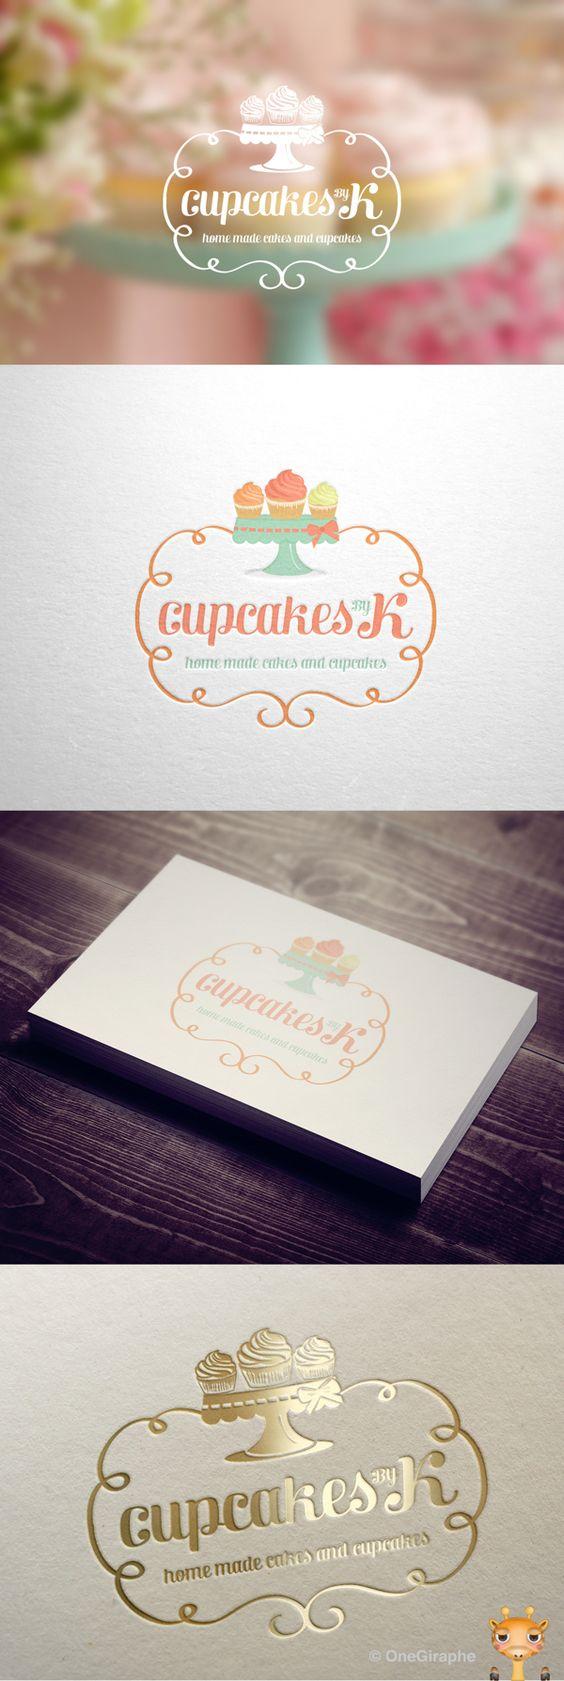 Cupcakes by K - Logo for Sale! by OneGiraphe, via Behance